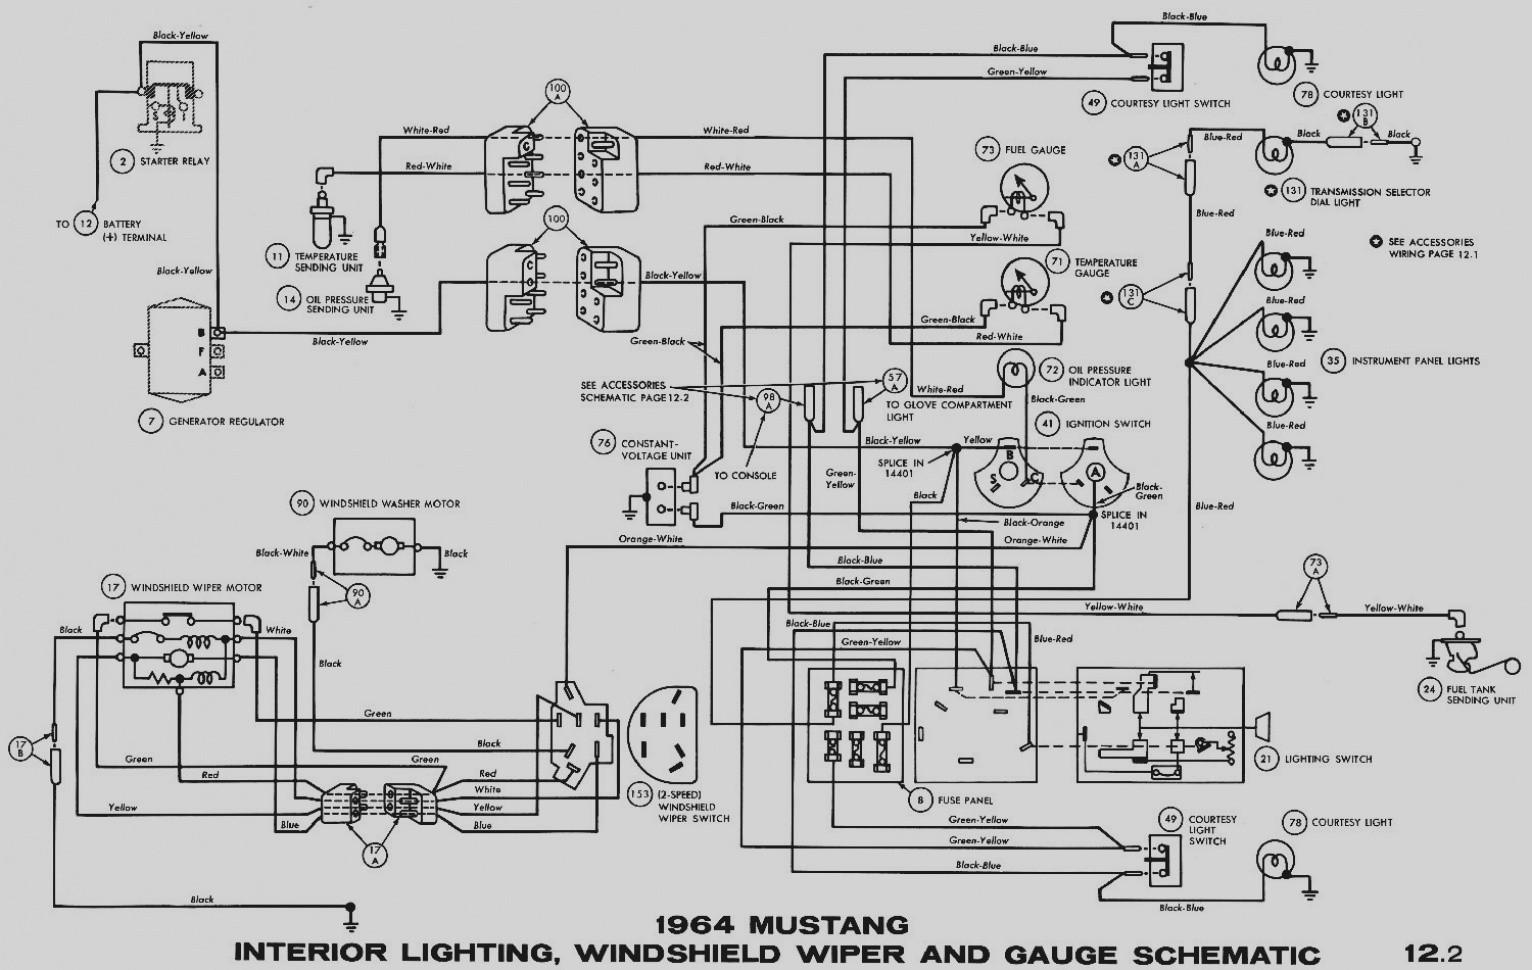 65 Mustang Wiper Switch Wiring Diagram Free Download Wiring Diagram